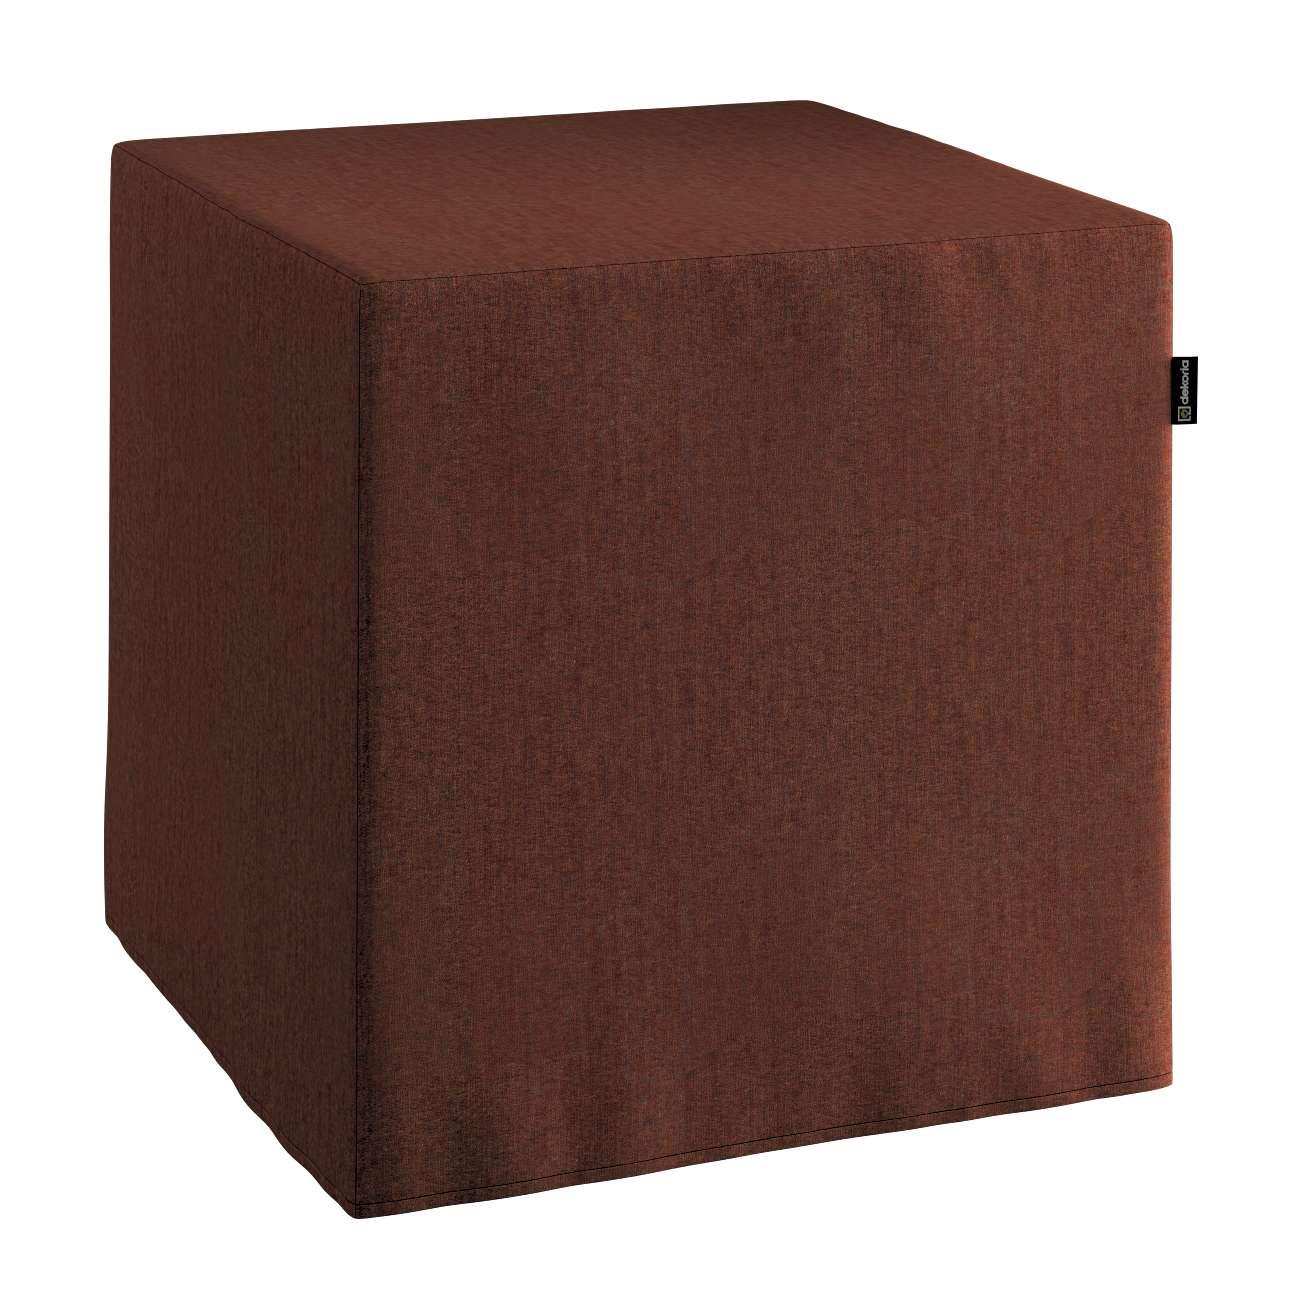 Sedák kostka - pevná 40 x 40 x 40 cm v kolekci Chenille , látka: 702-18